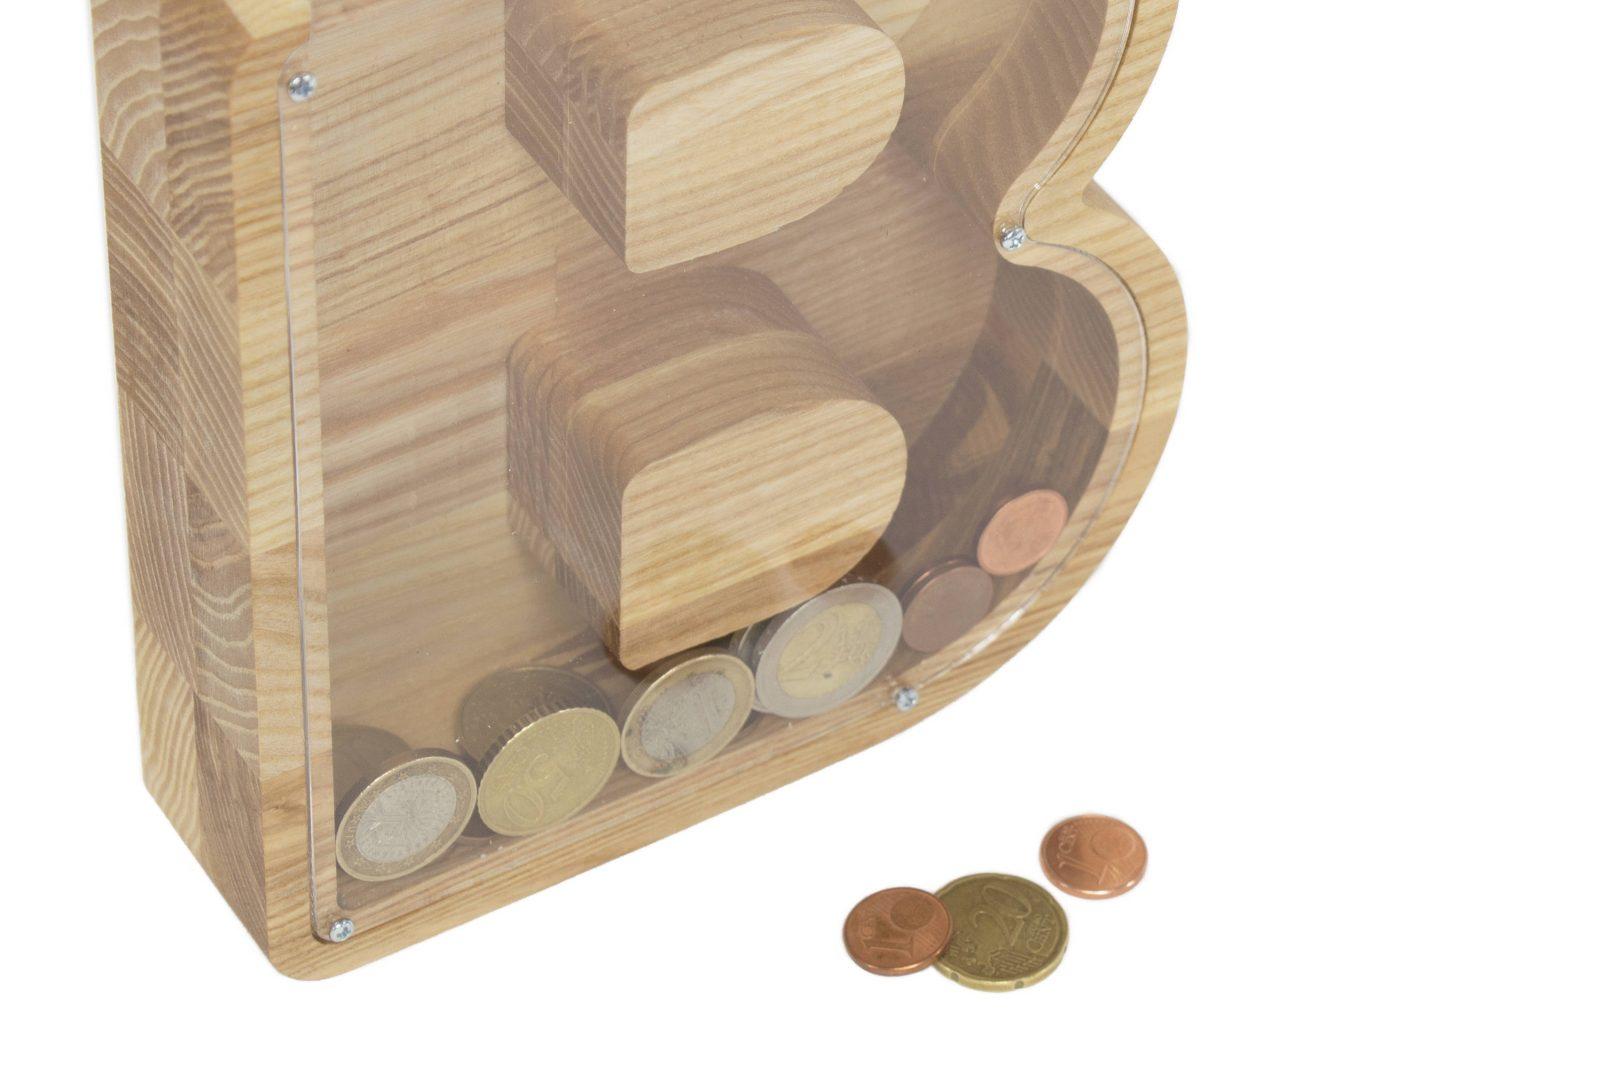 Peronalized Initial Piggy Bank